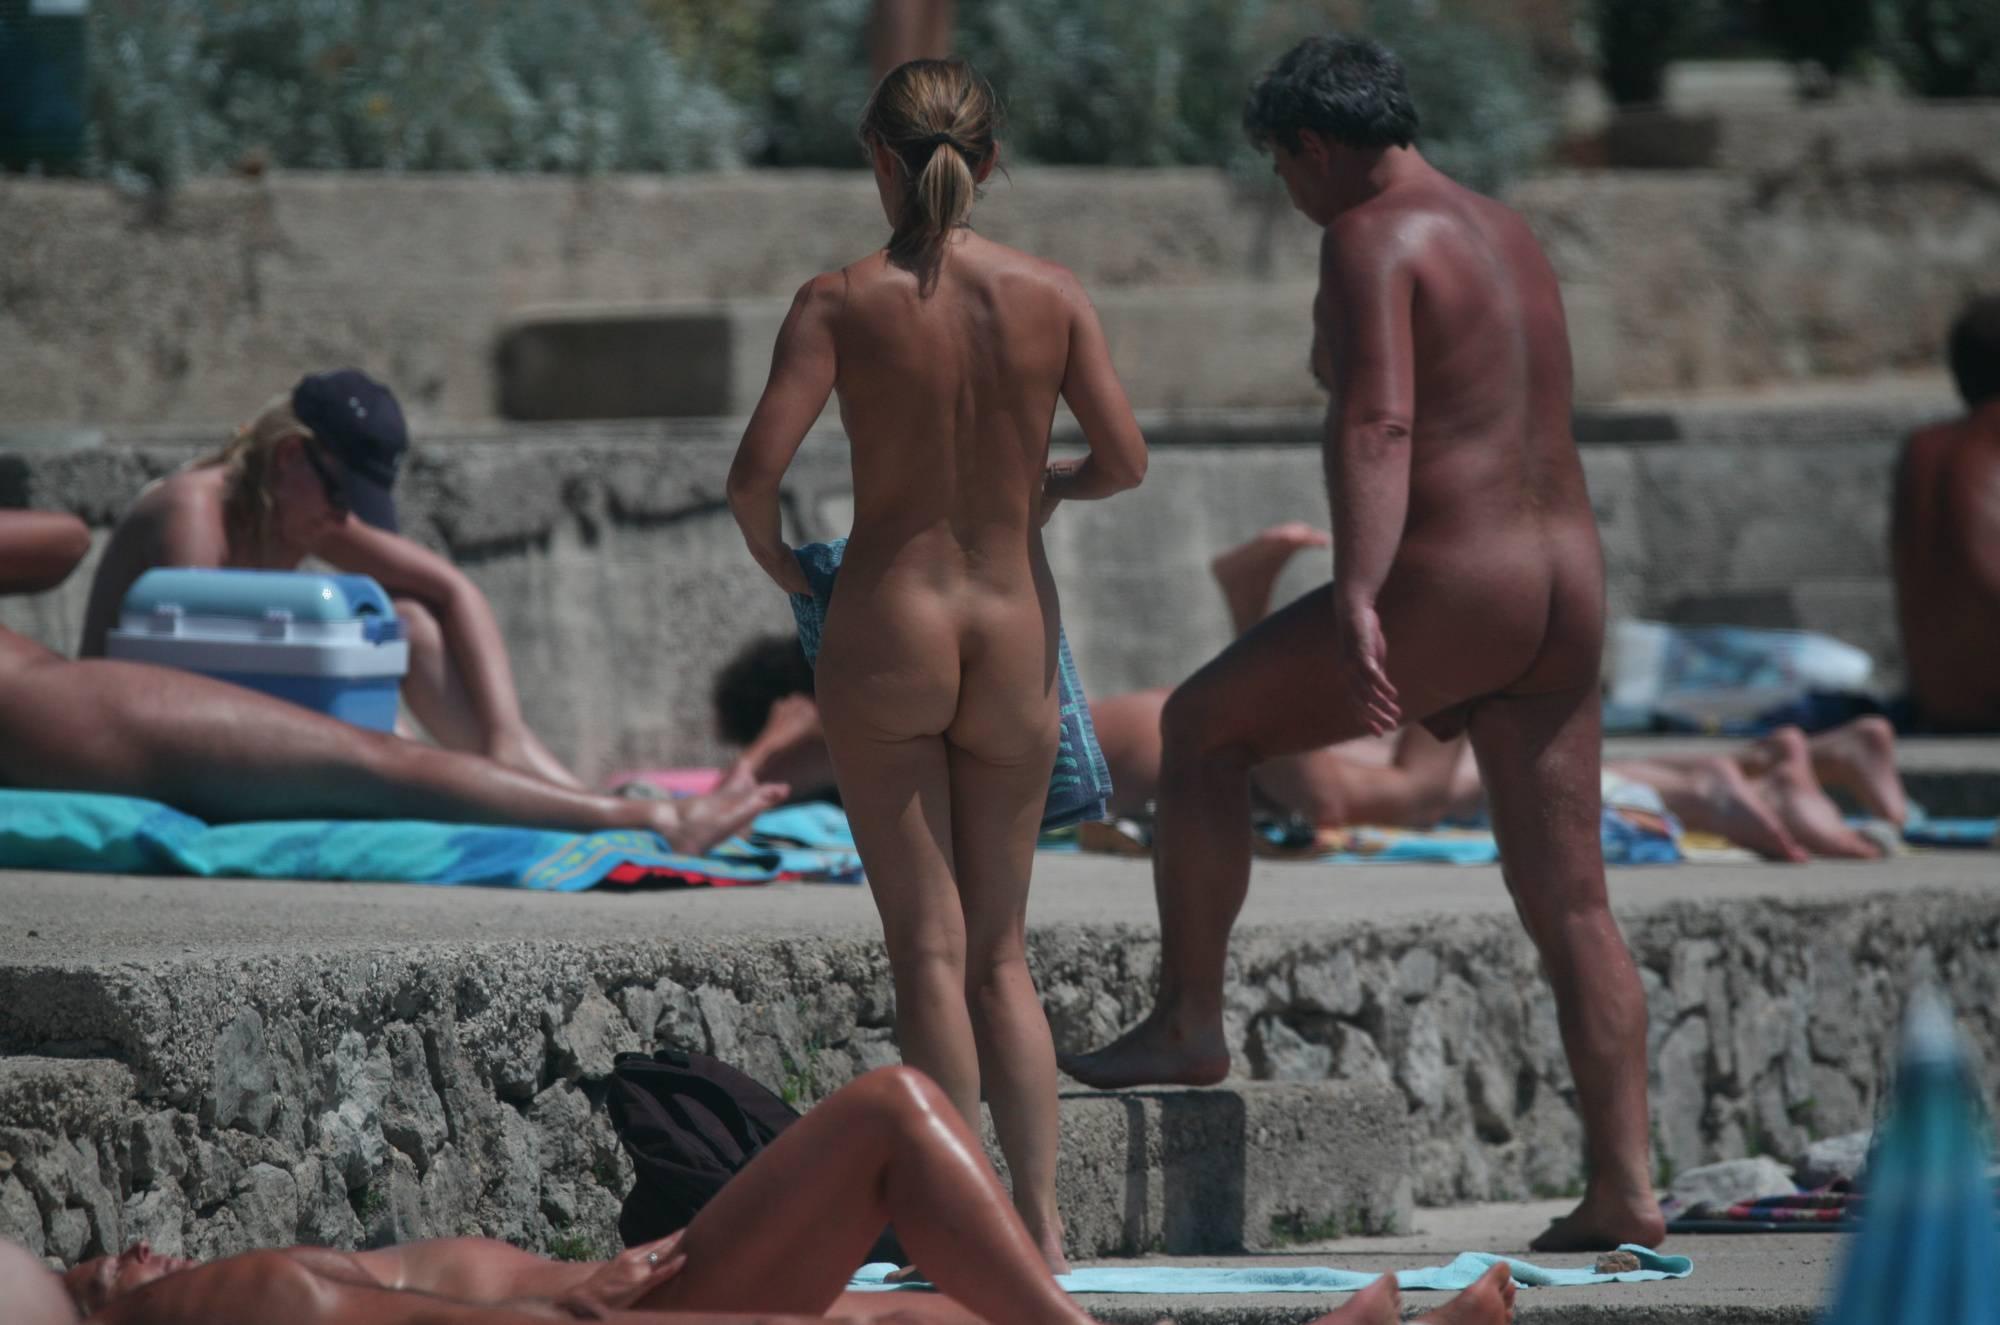 Nudist Photos Cove Pyramid Woman - 2